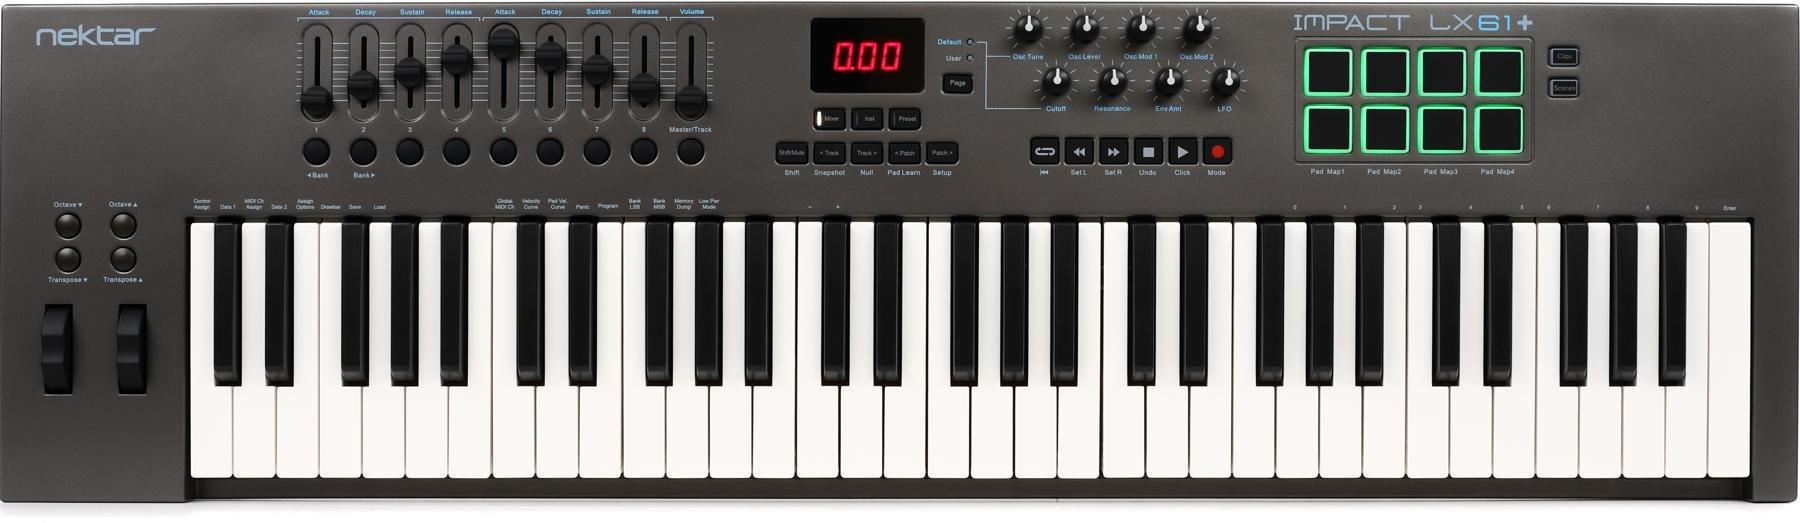 Nektar Impact LX61+ 61-key Keyboard Controller | Sweetwater